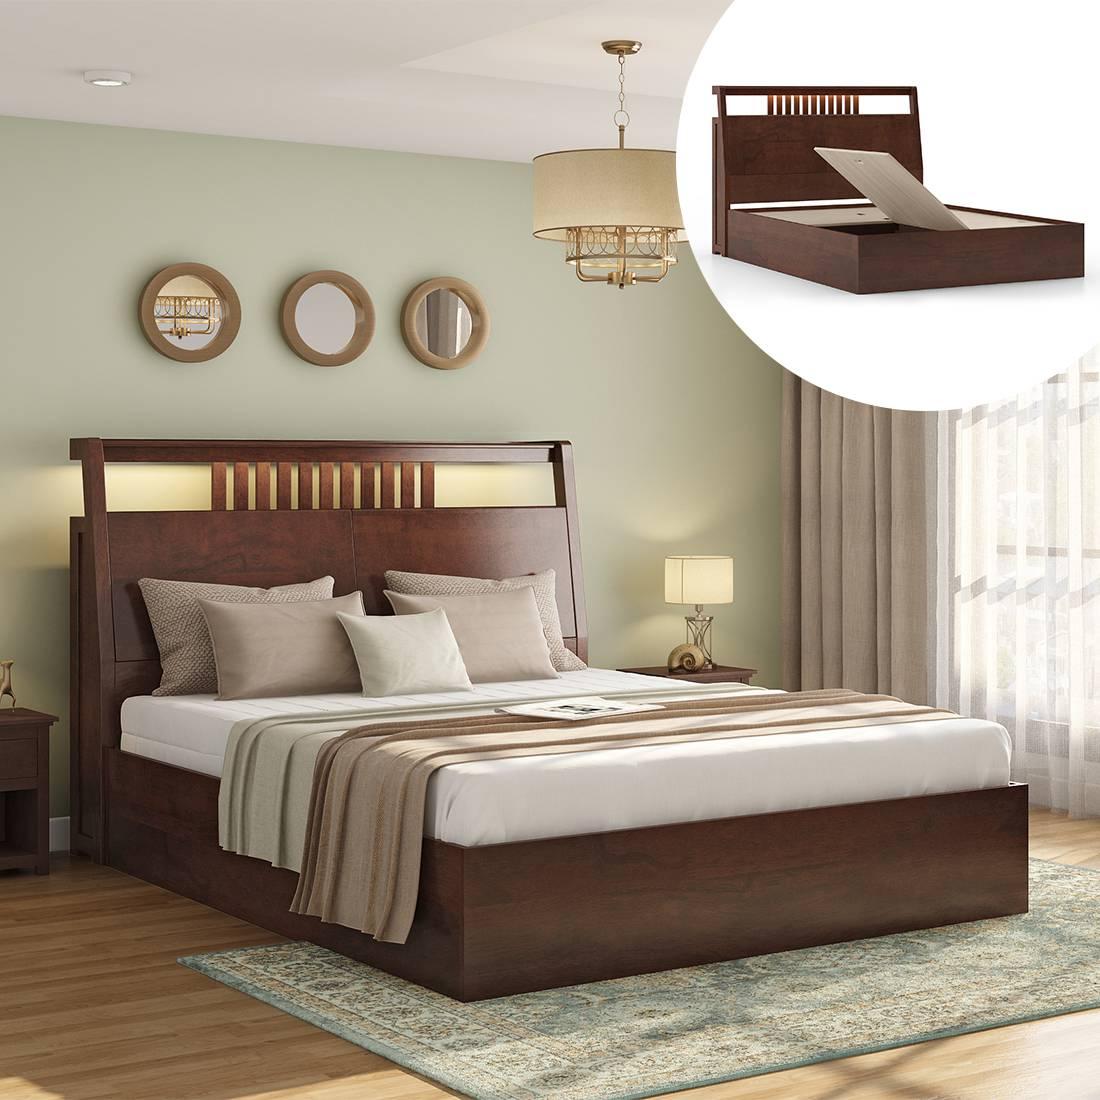 Bed Design 250 Latest Bed Designs Online In India Best Prices Urban Ladder